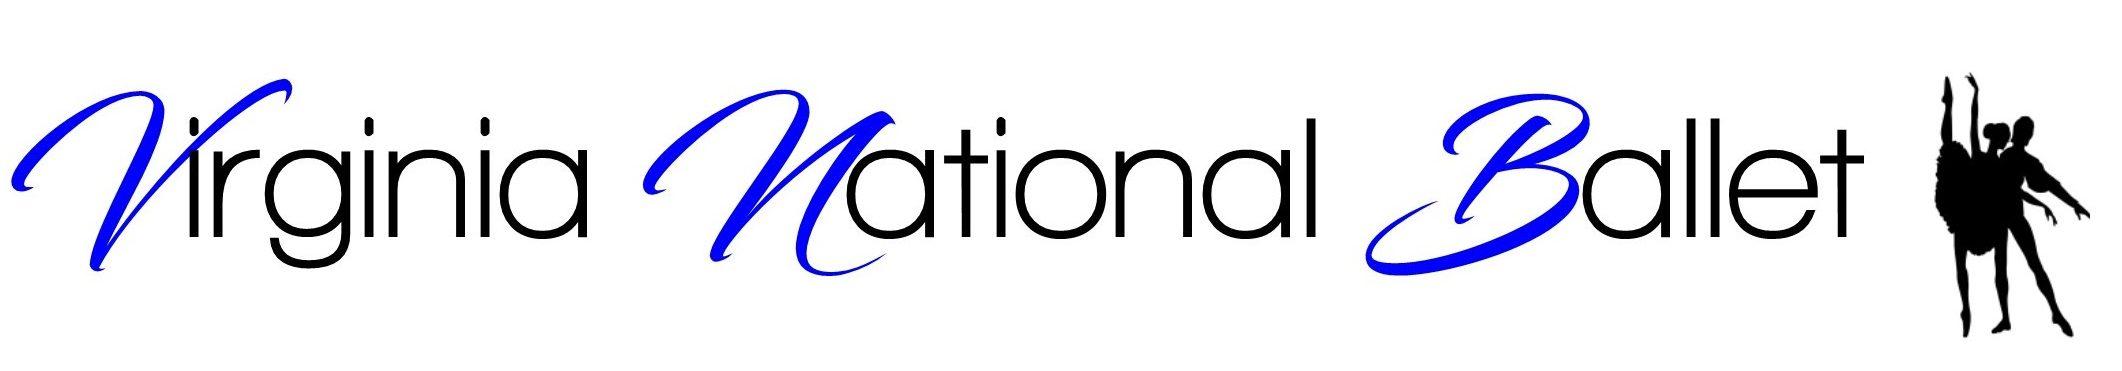 https://virginianationalballet.org/wp-content/uploads/2017/04/cropped-virginia-national-ballet-logo-2-1.jpg